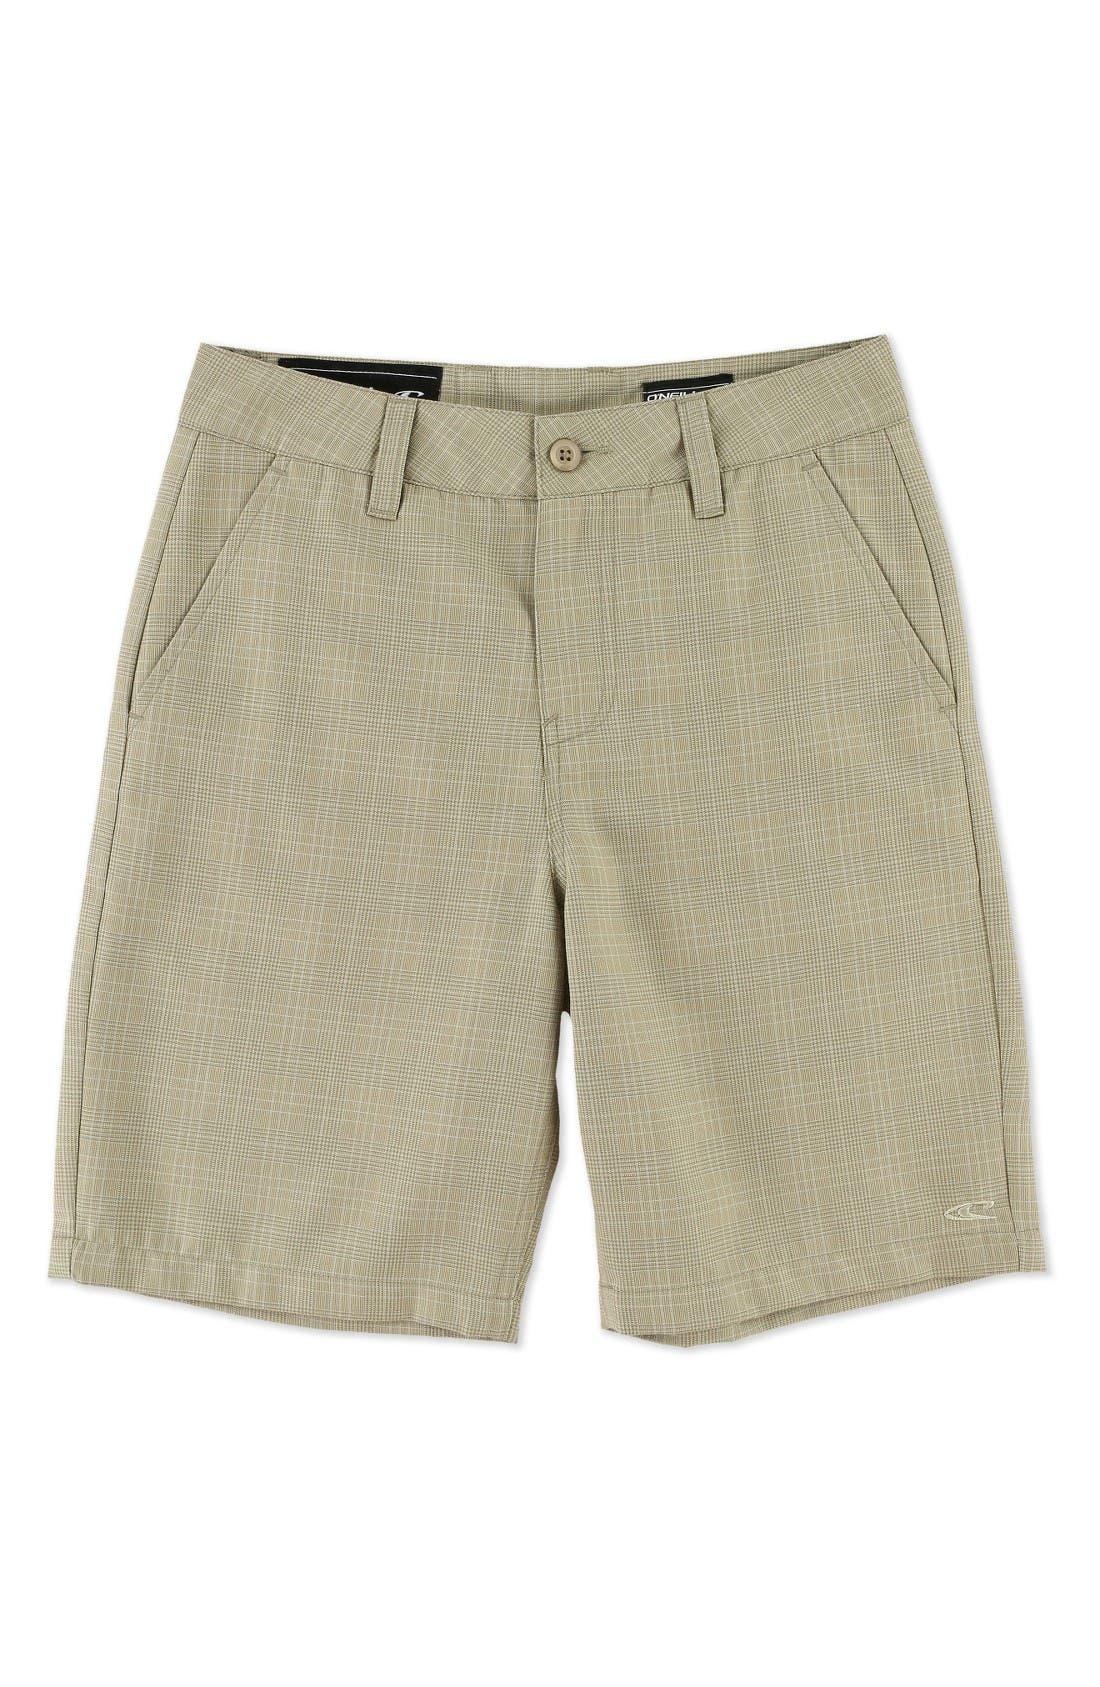 Delta Plaid Chino Shorts,                         Main,                         color, Dark Stone